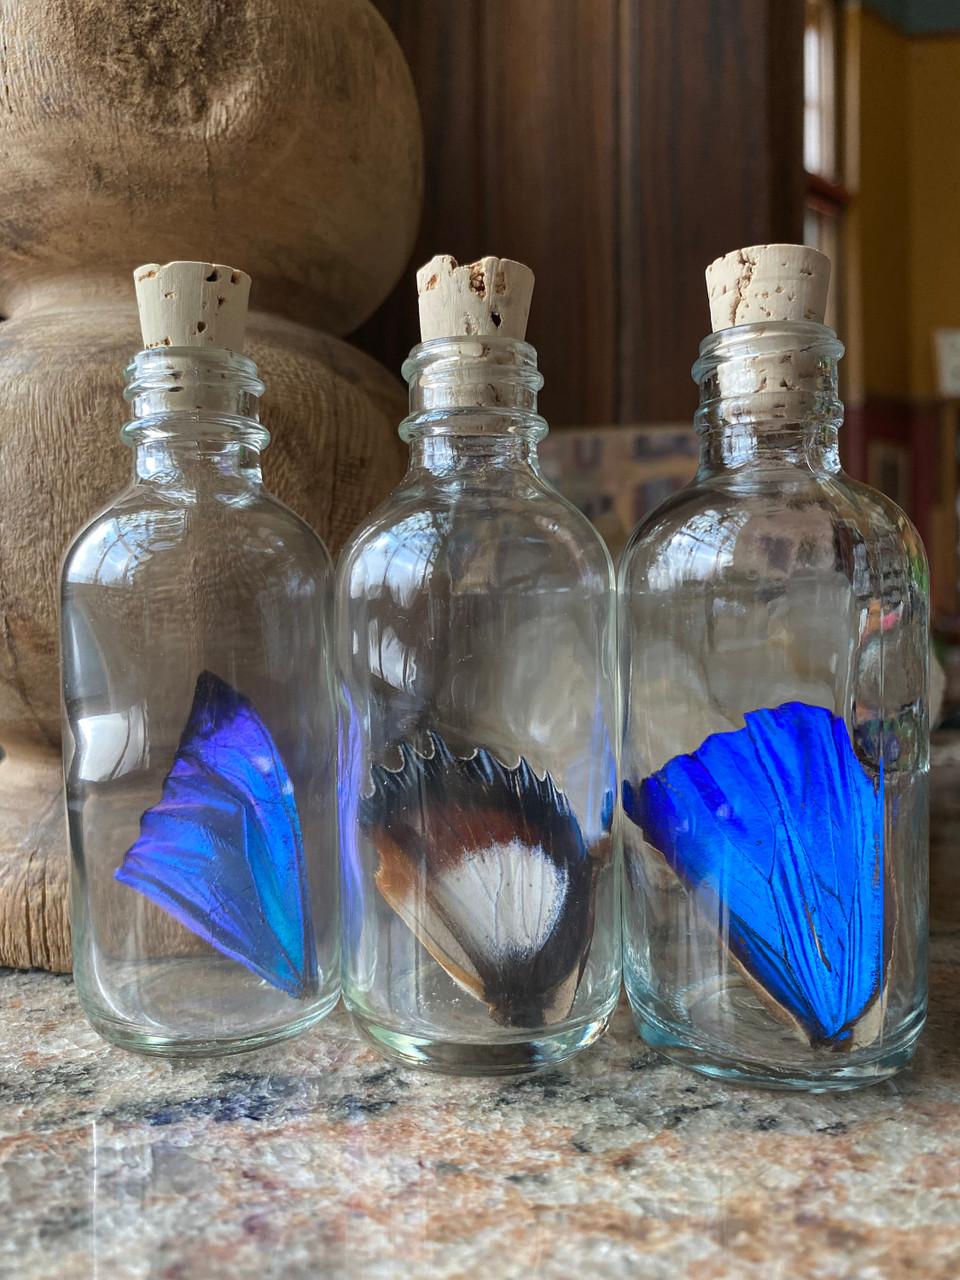 Real Butterfly Wing in Bottle XLarge